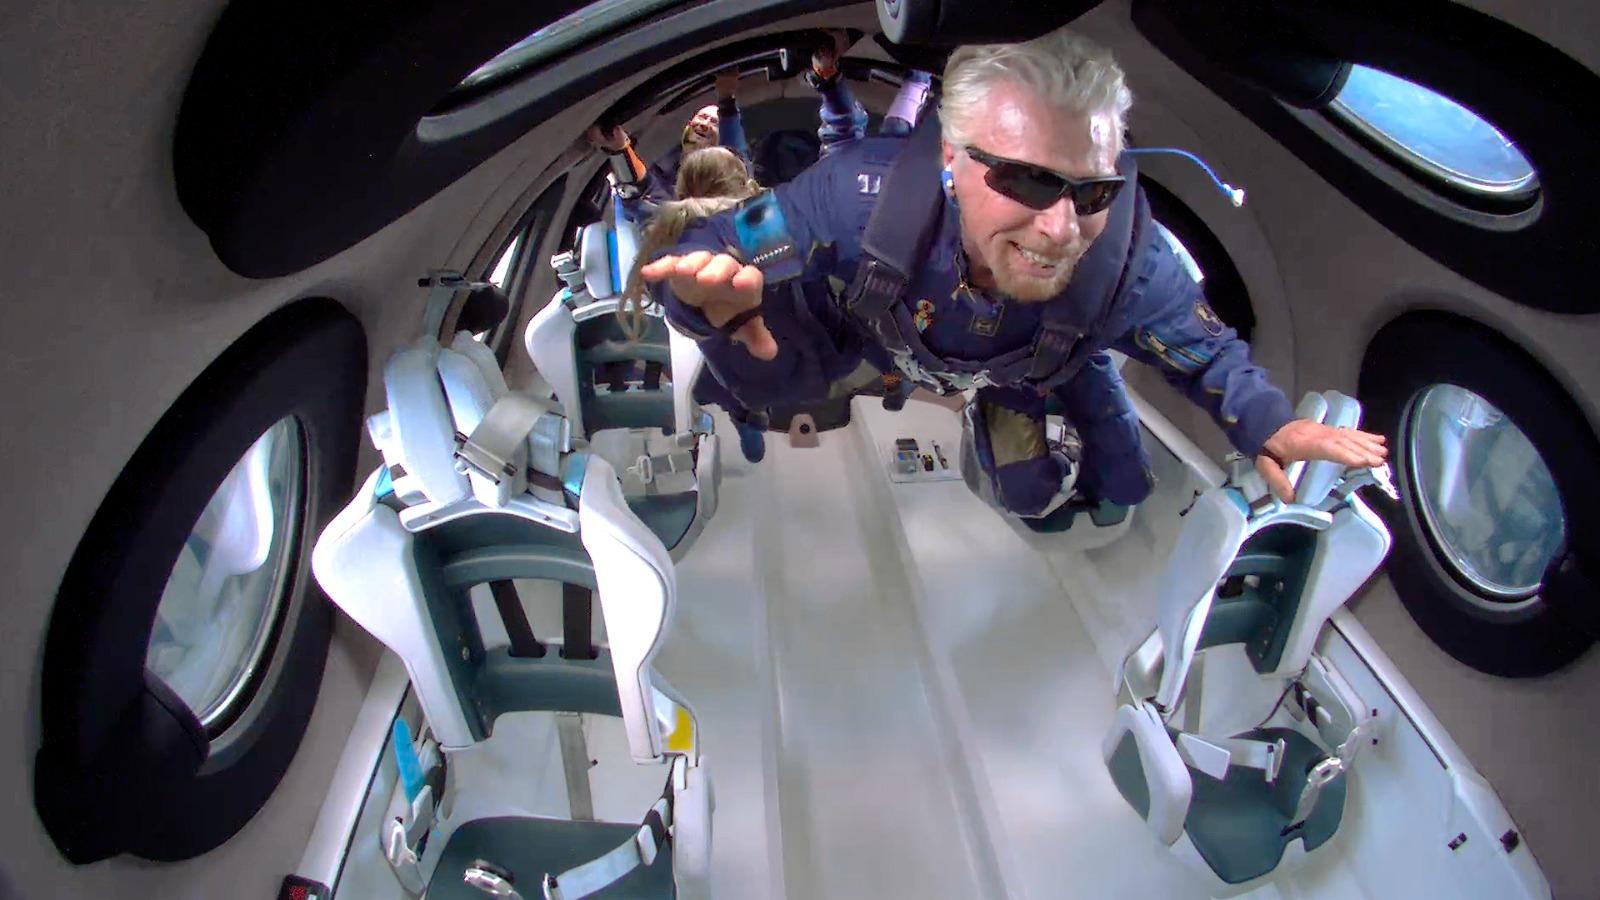 Sir Richard Branson is weightless in space on his Virgin Galactic passenger rocket plane.